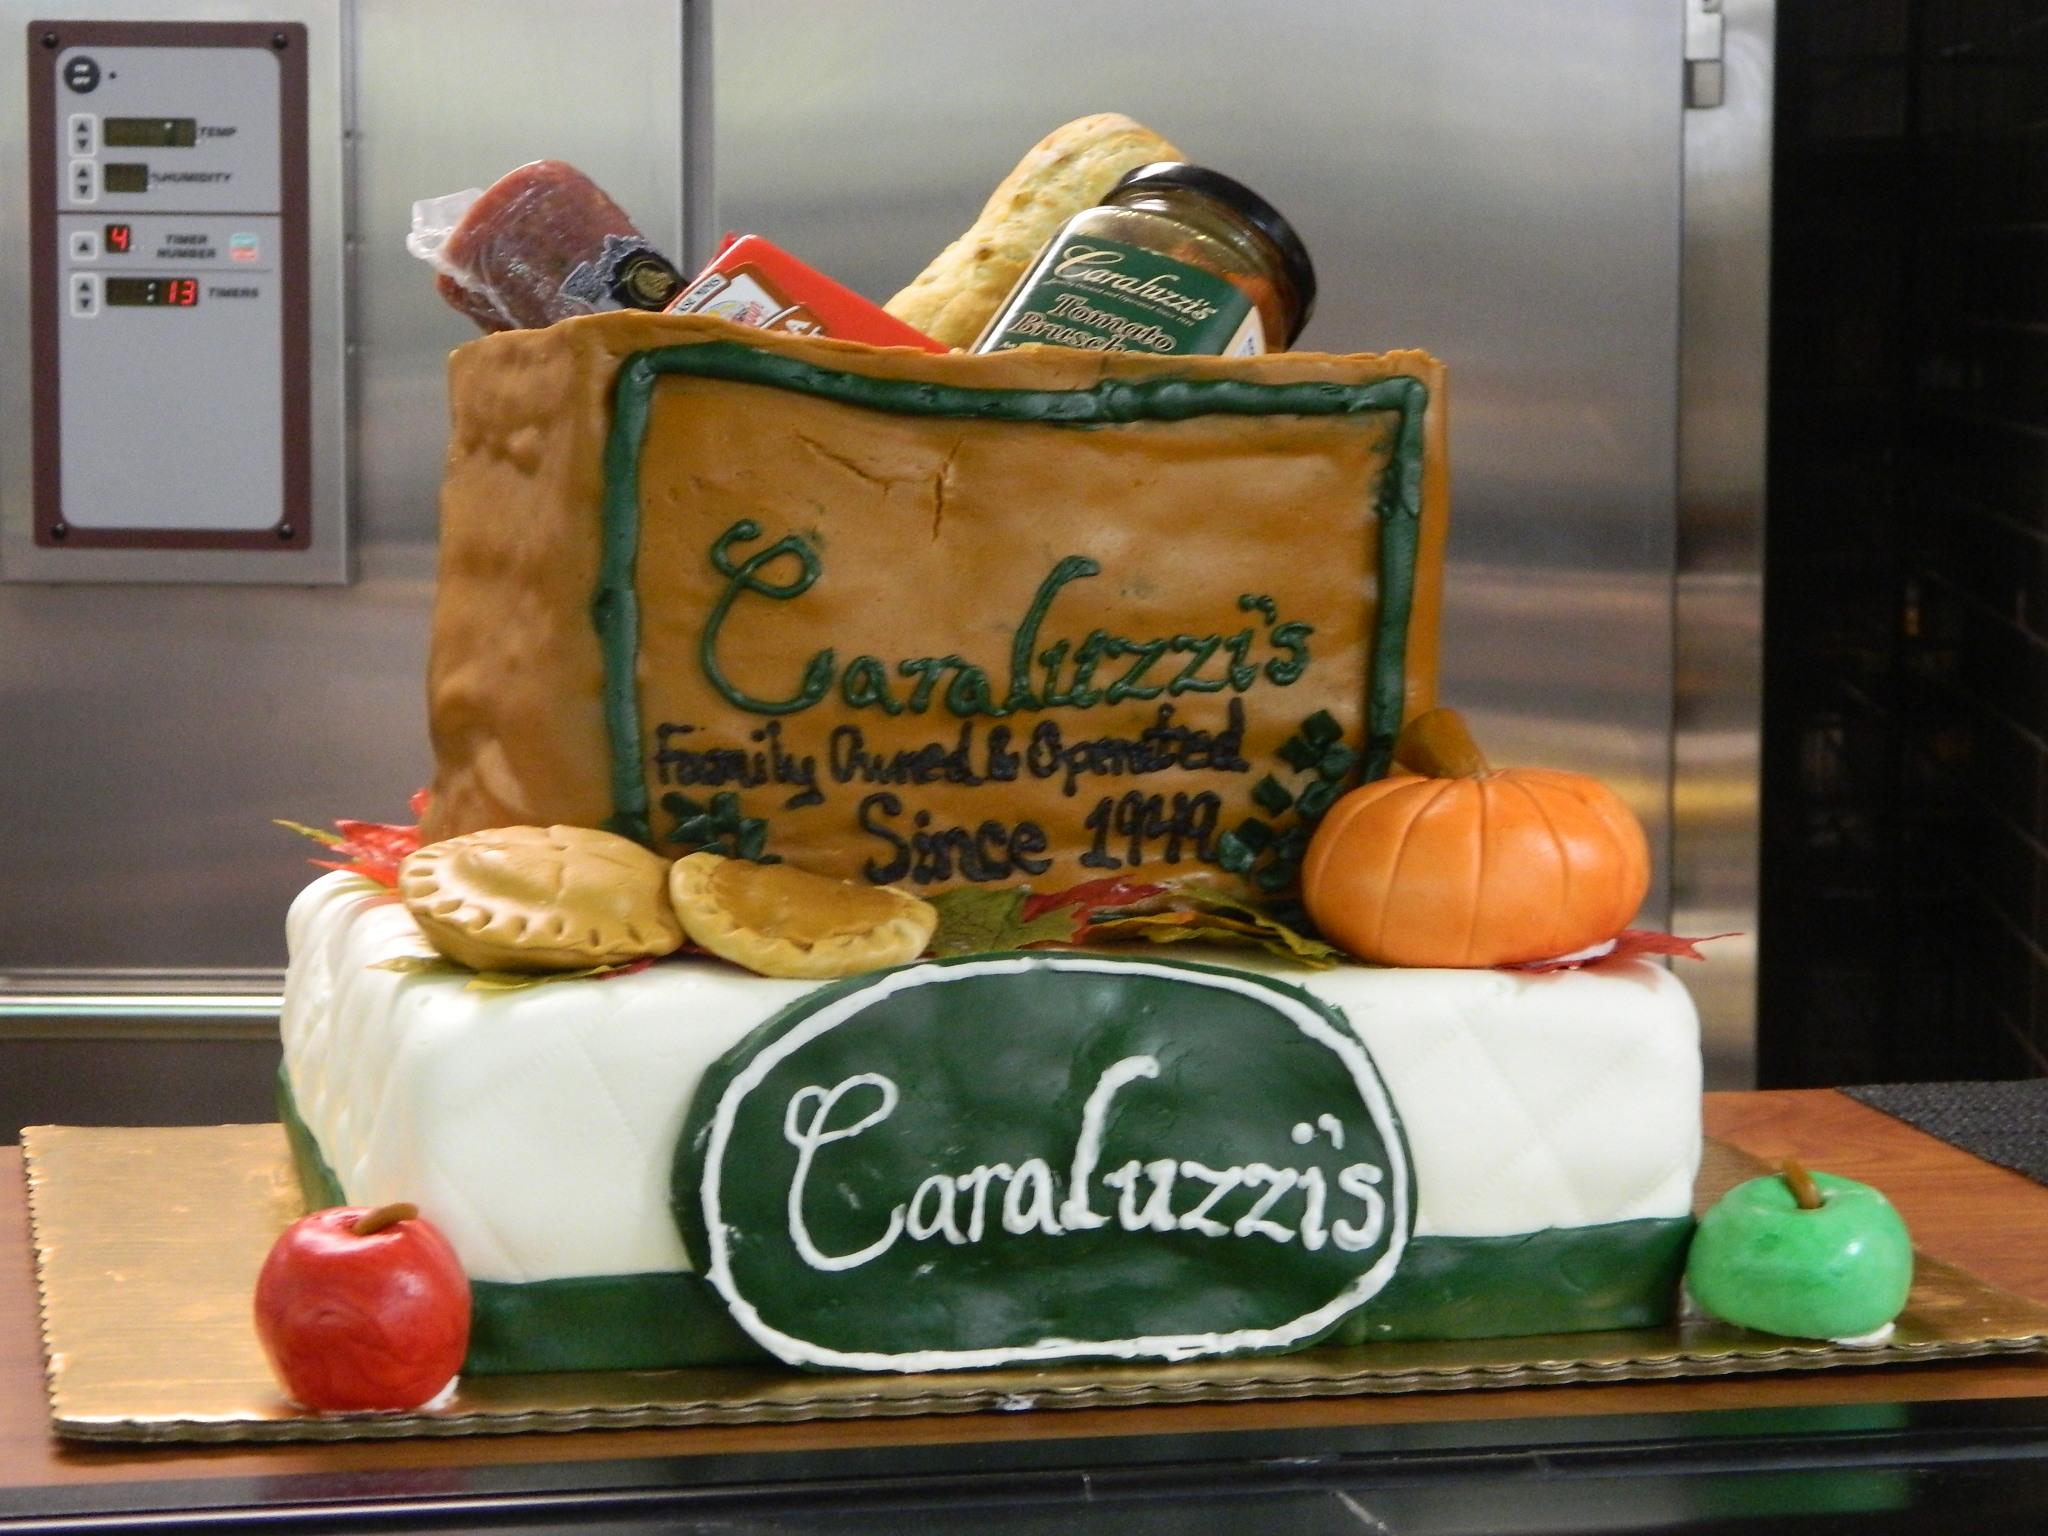 Caraluzzi's Georgetown Market Expands to Meet Area's Growing